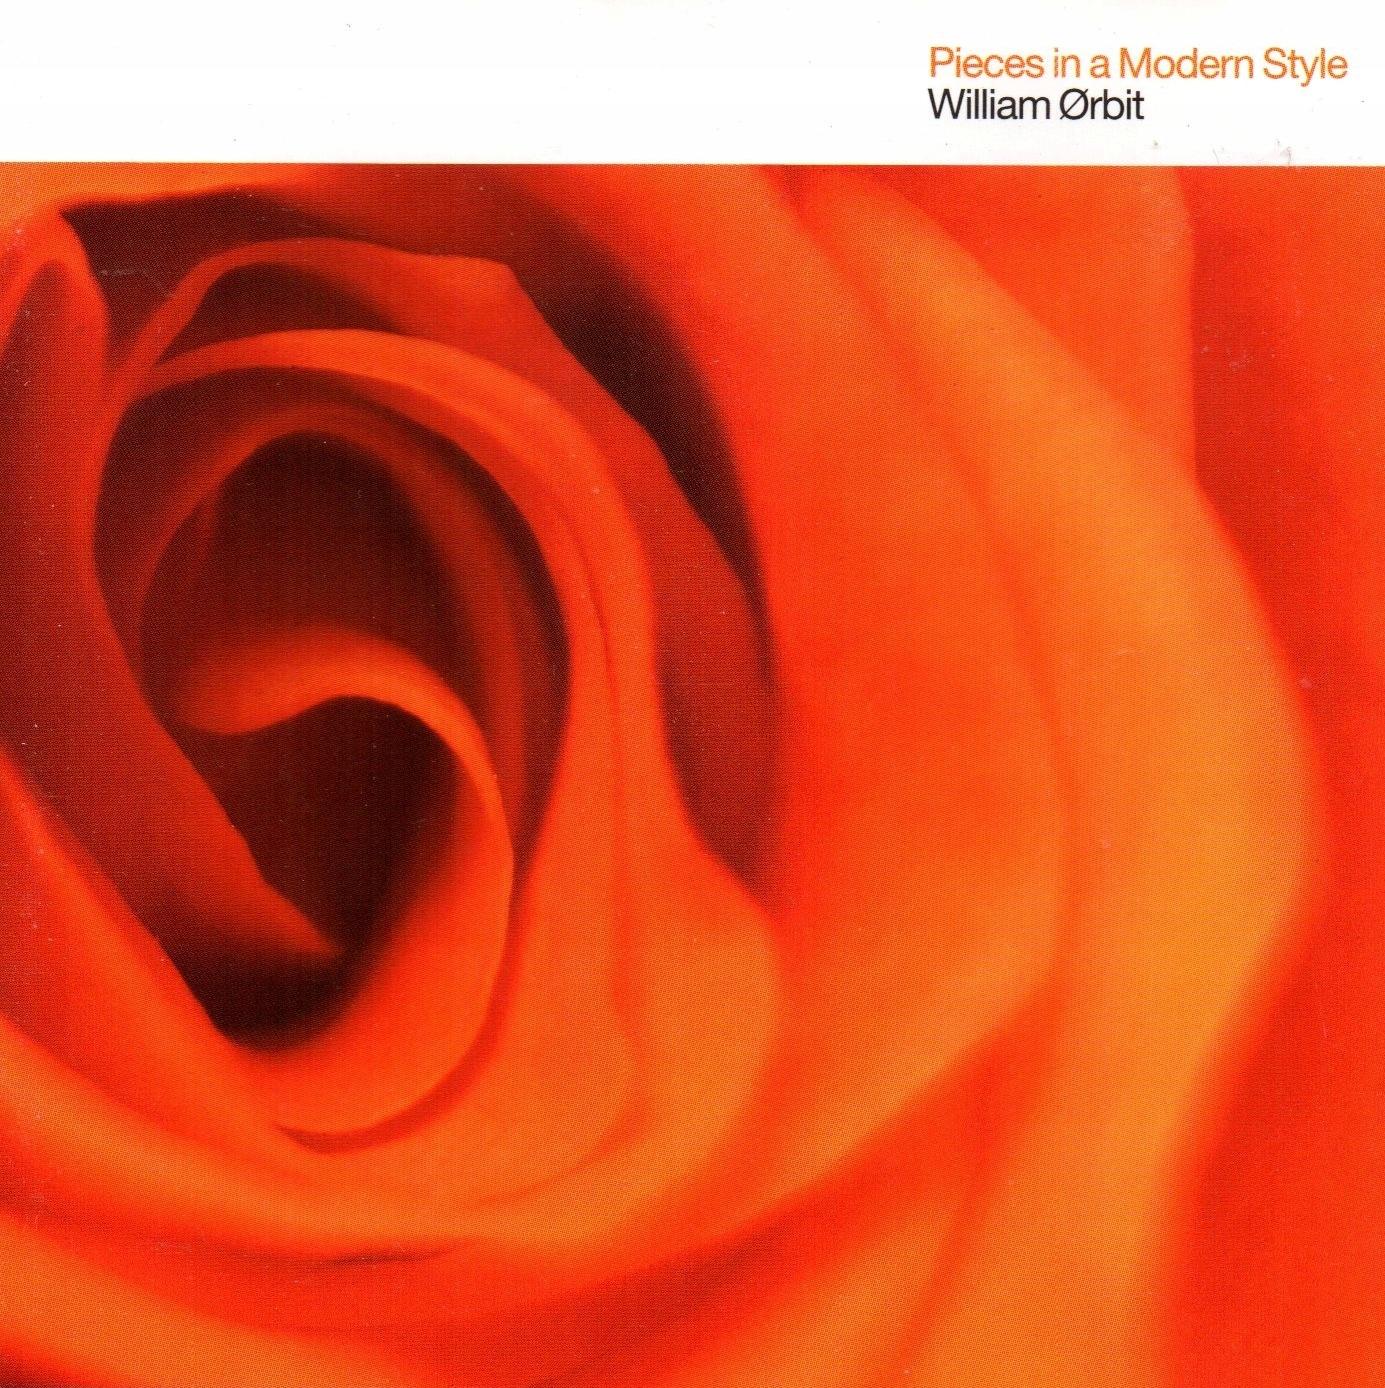 William Orbit | Pieces in a Modern Style album cover